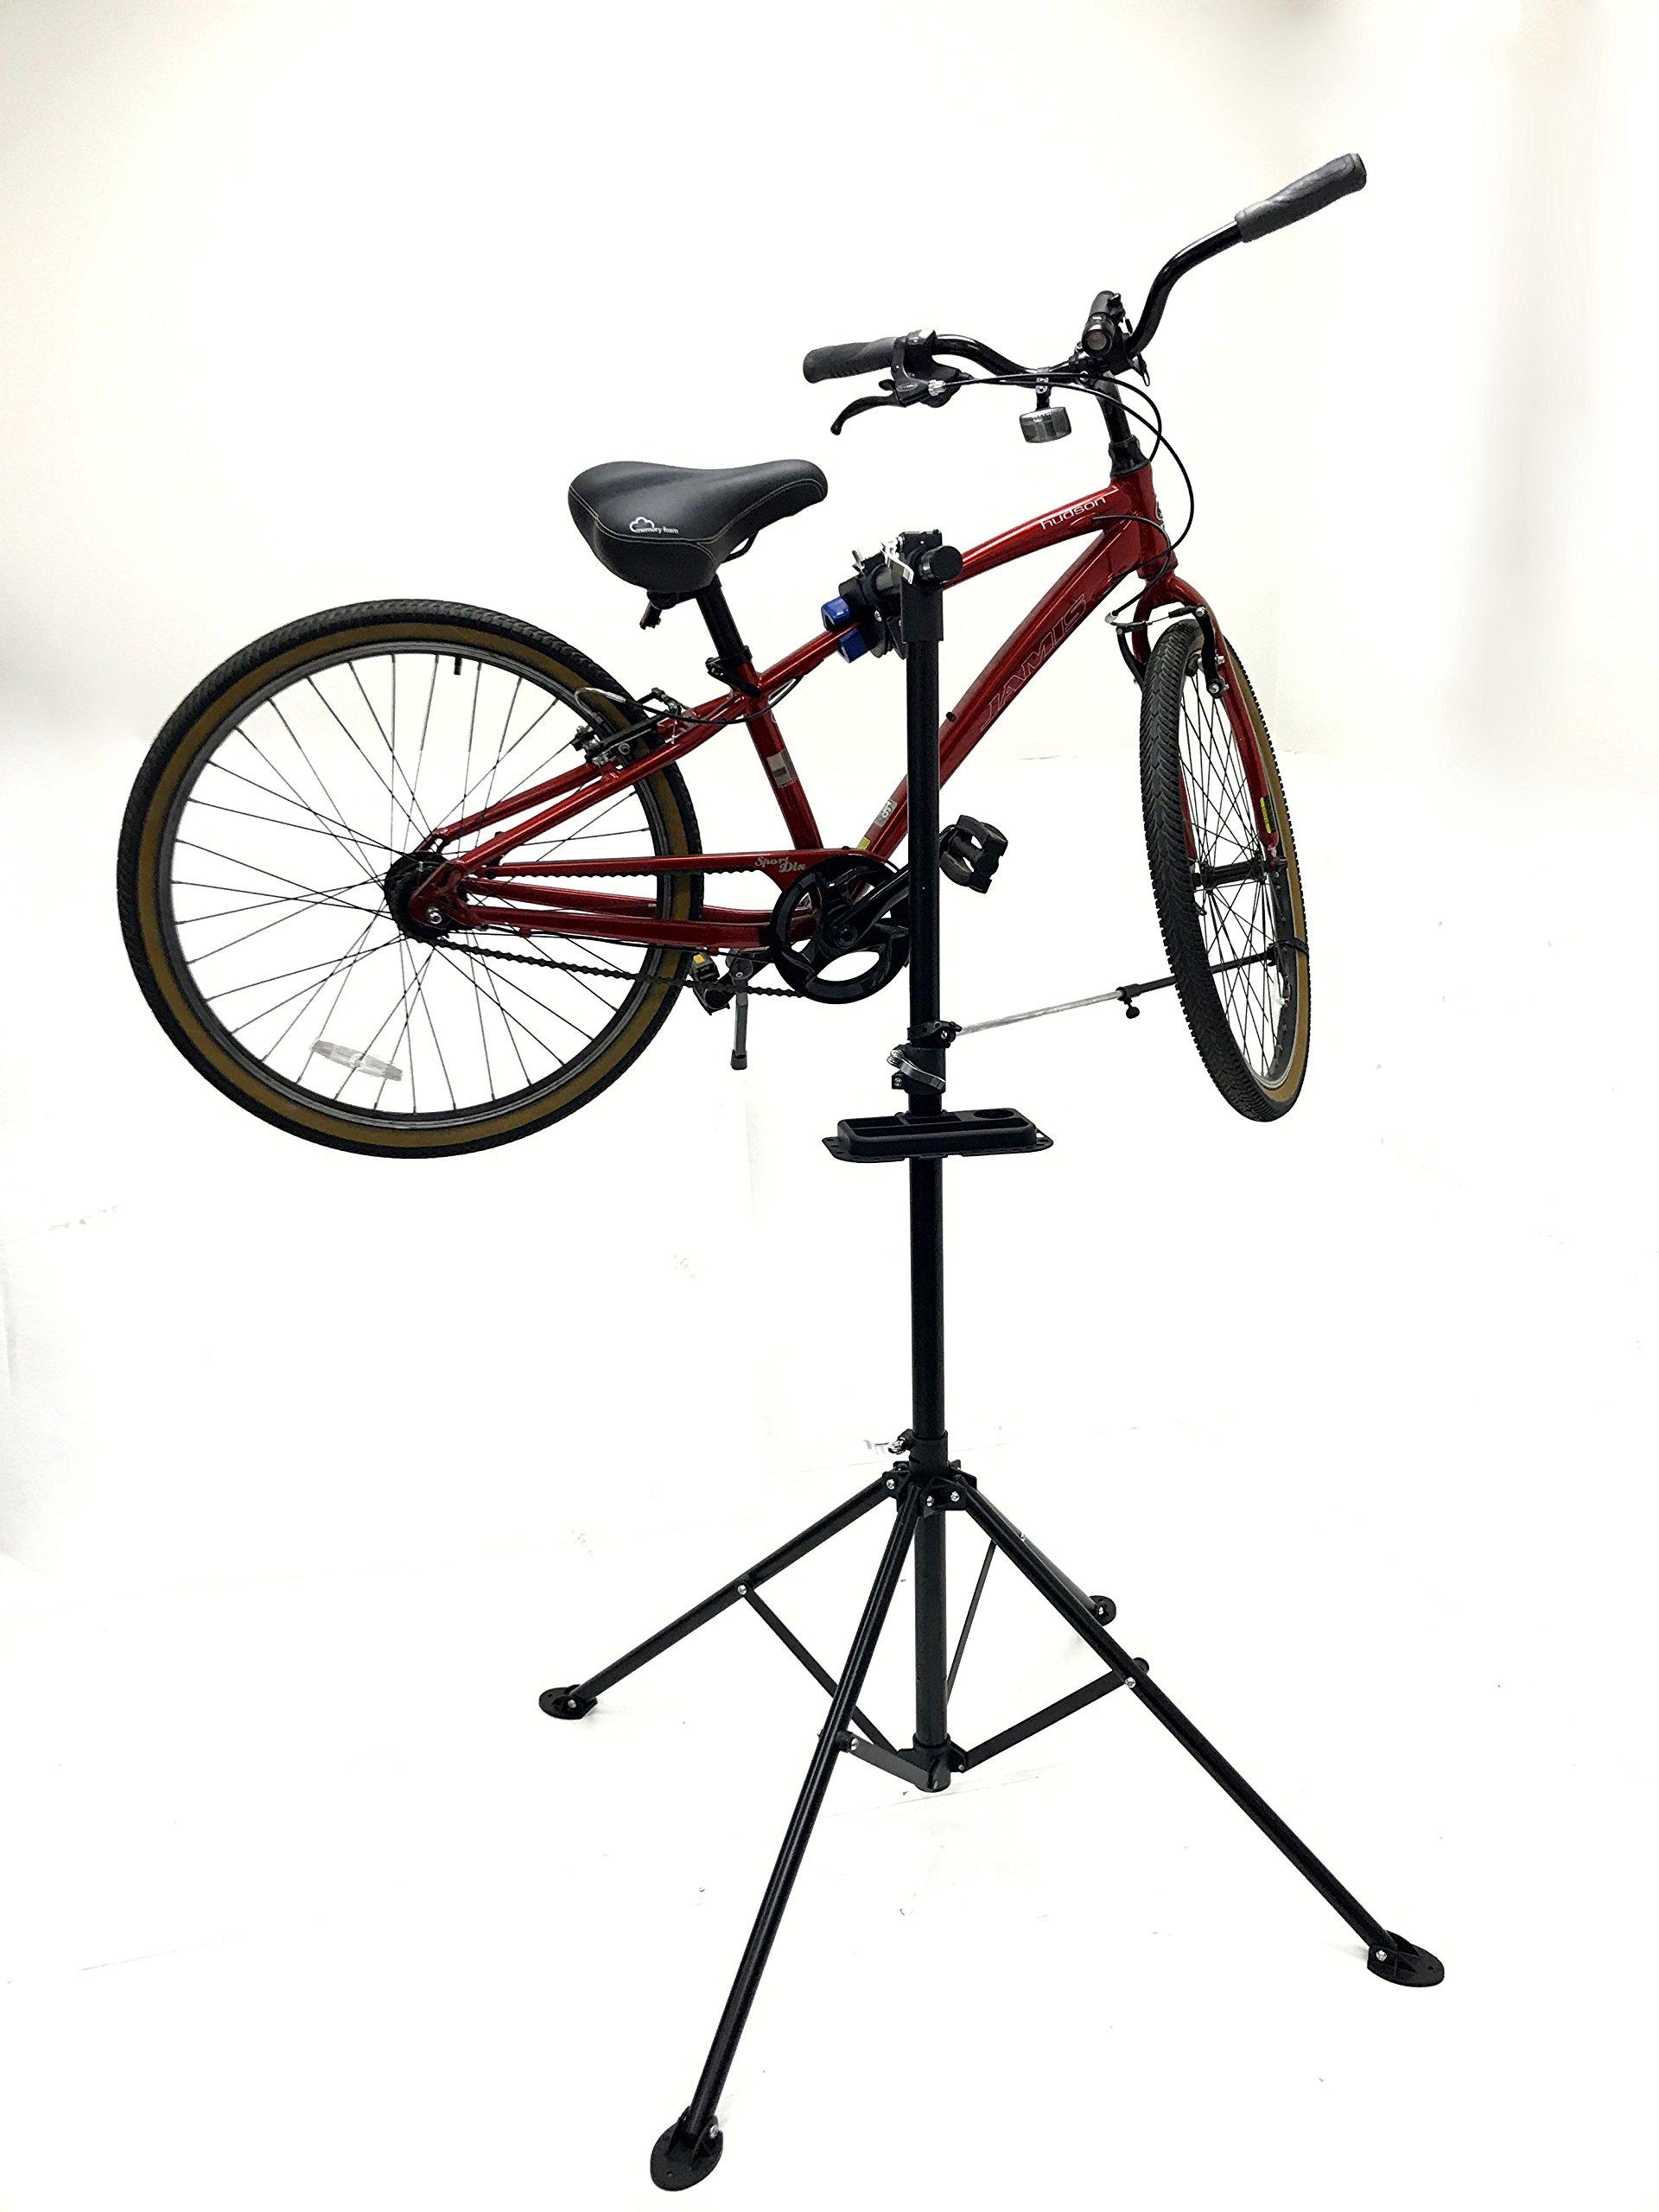 MaxxHaul 80725 Bike Repair Stand/Display with Adjustable Height & 360 Deg. Rotating Head Clamp by MaxxHaul (Image #5)